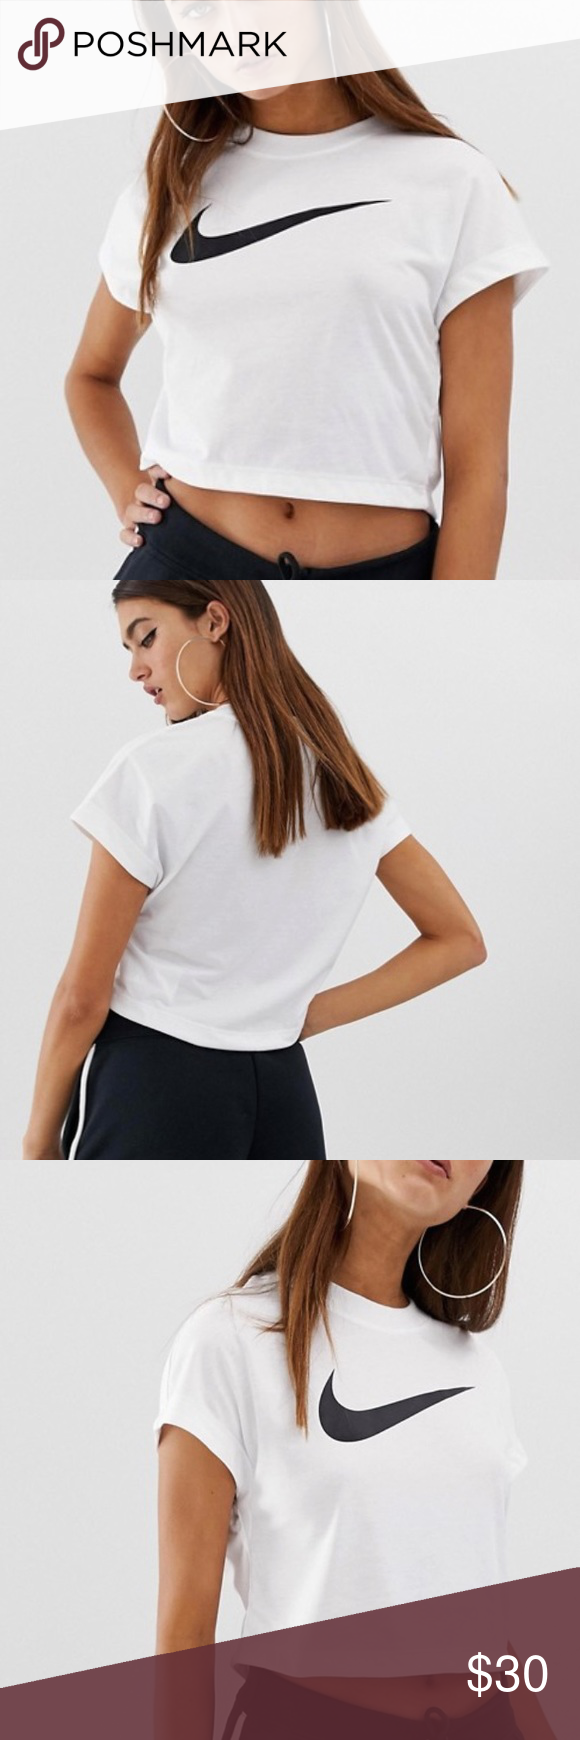 Nike Women S Swoosh Crop Top Crop Tops Fashion Pullover Styling [ 1740 x 580 Pixel ]